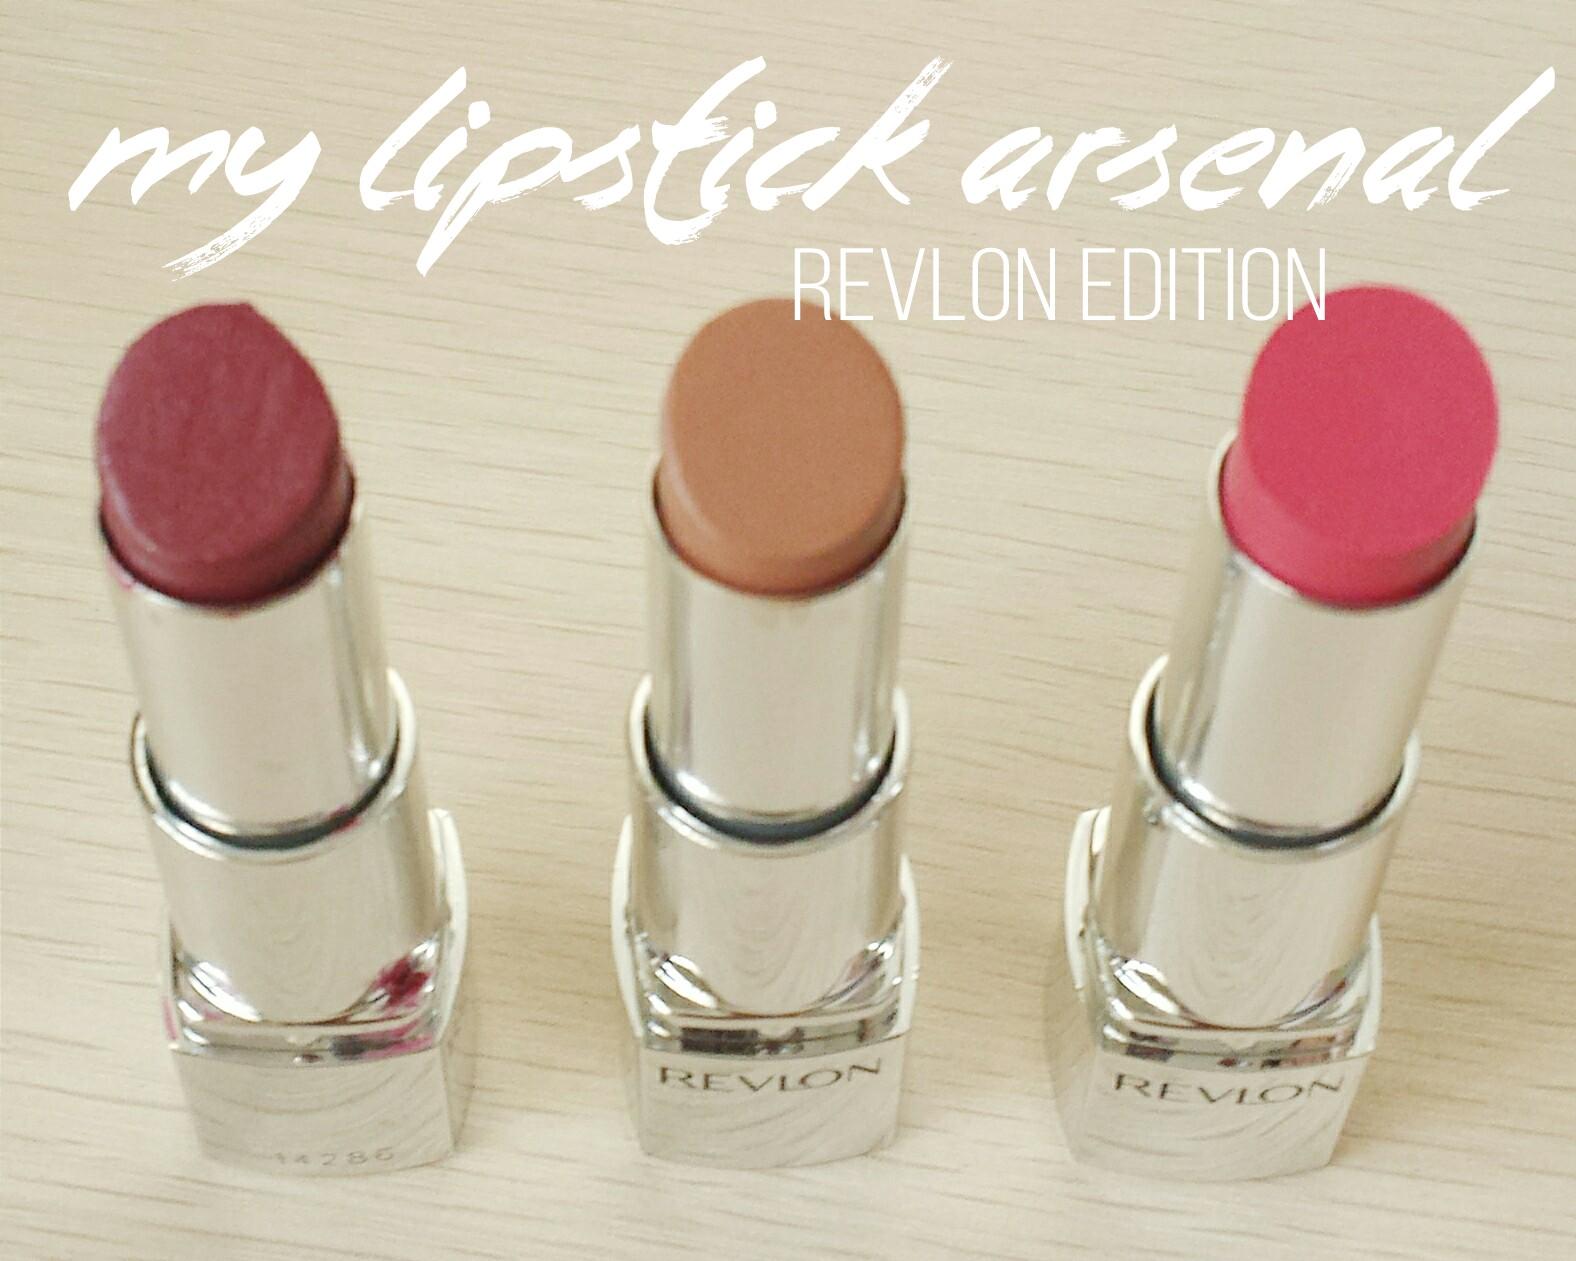 craftgeekescapist-lipstick-arsenal-revlon